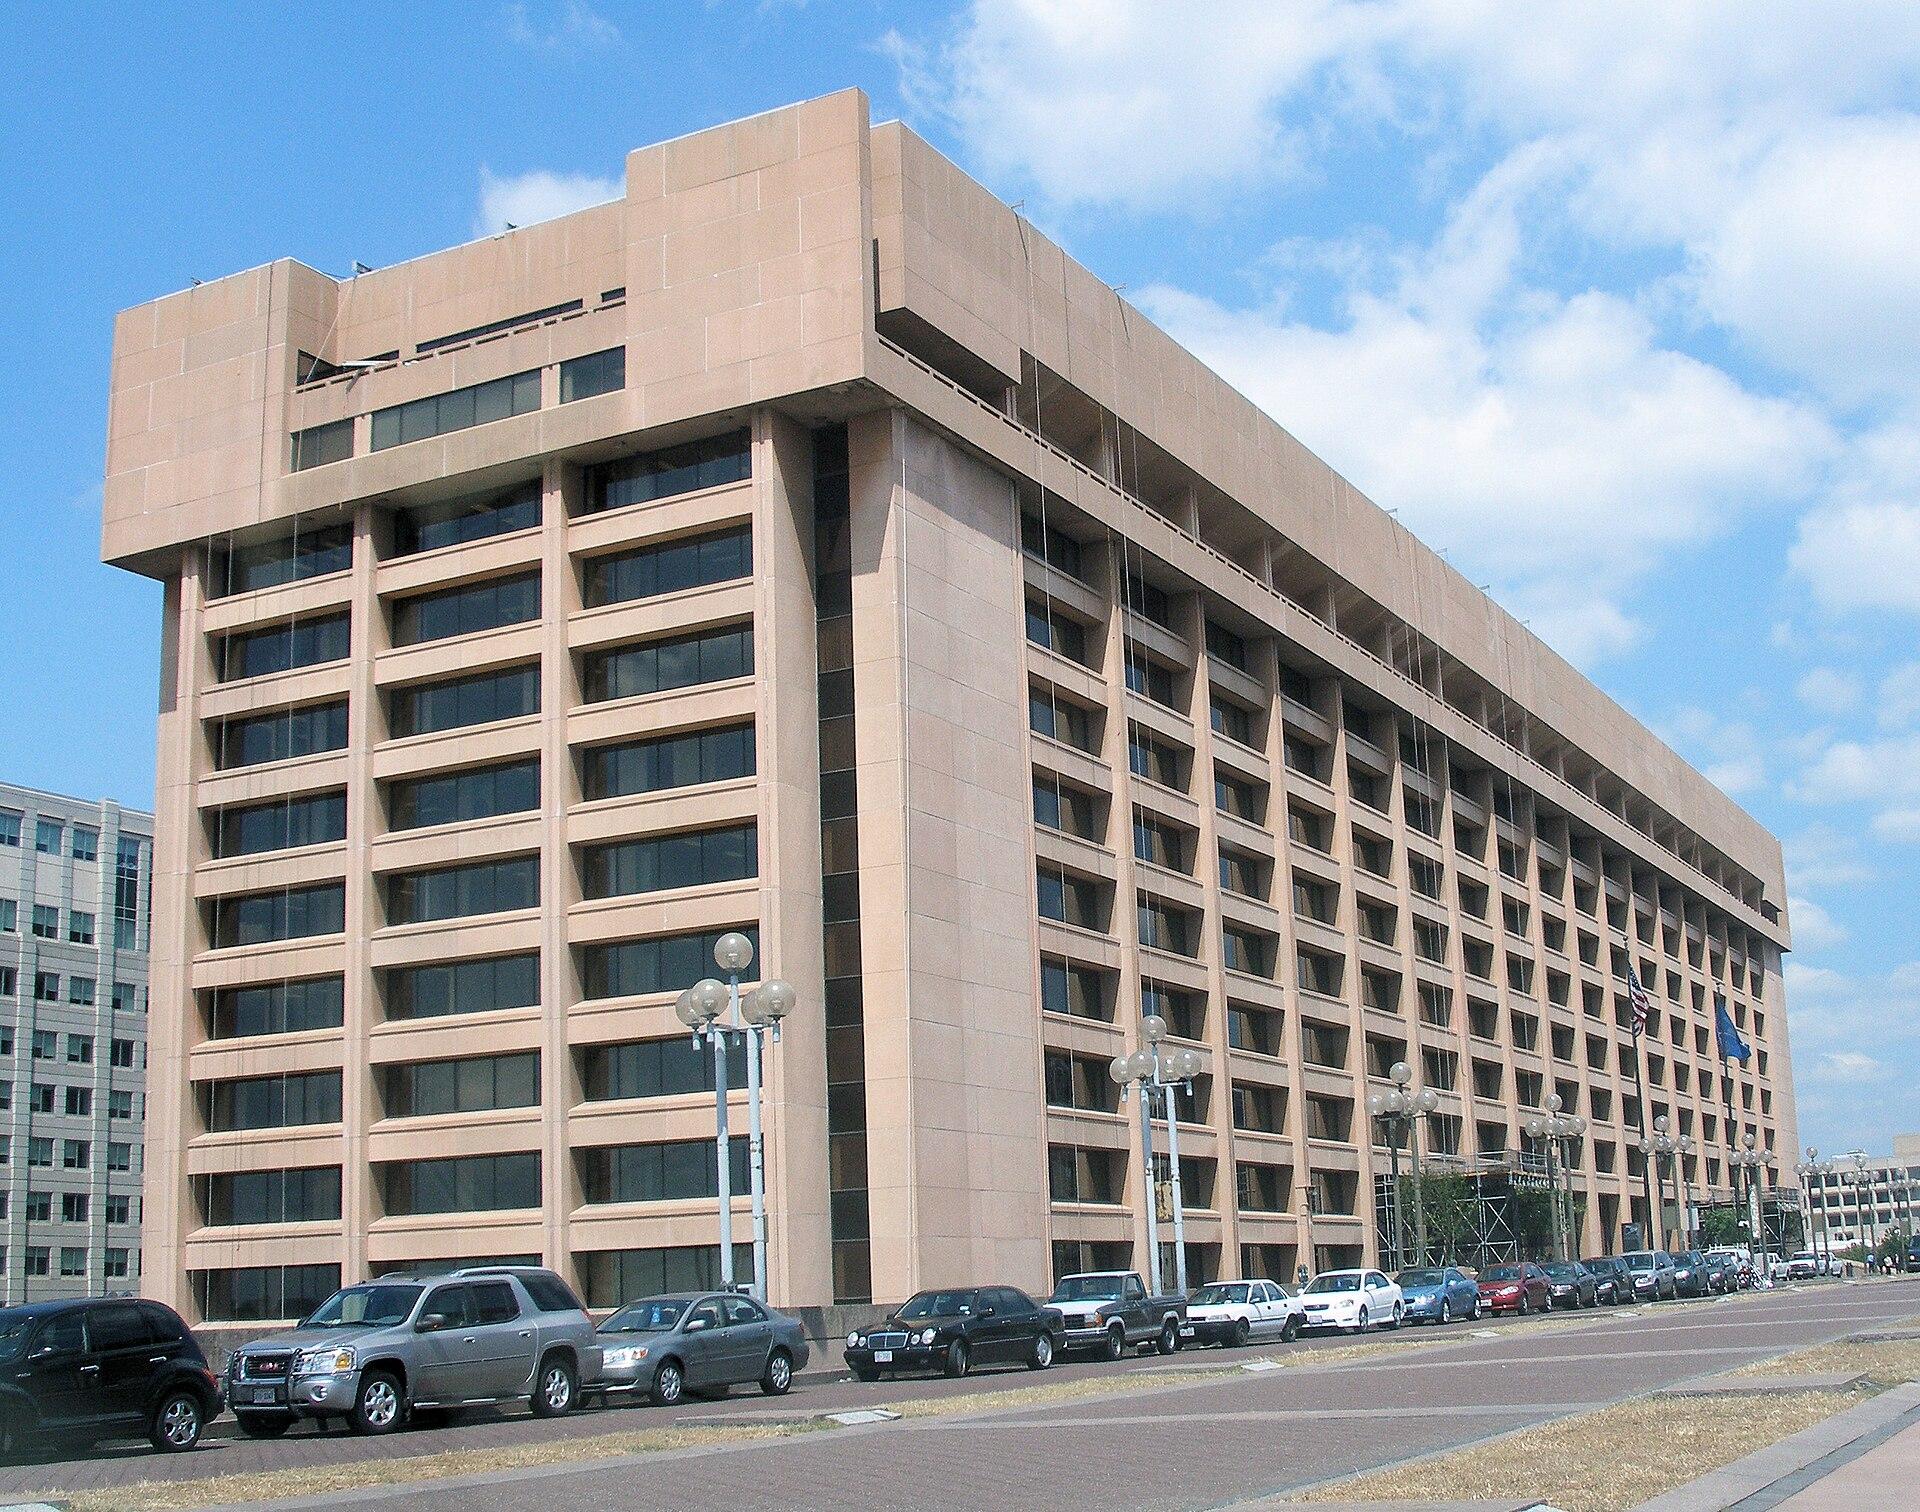 United States Postal Service Wikipedia